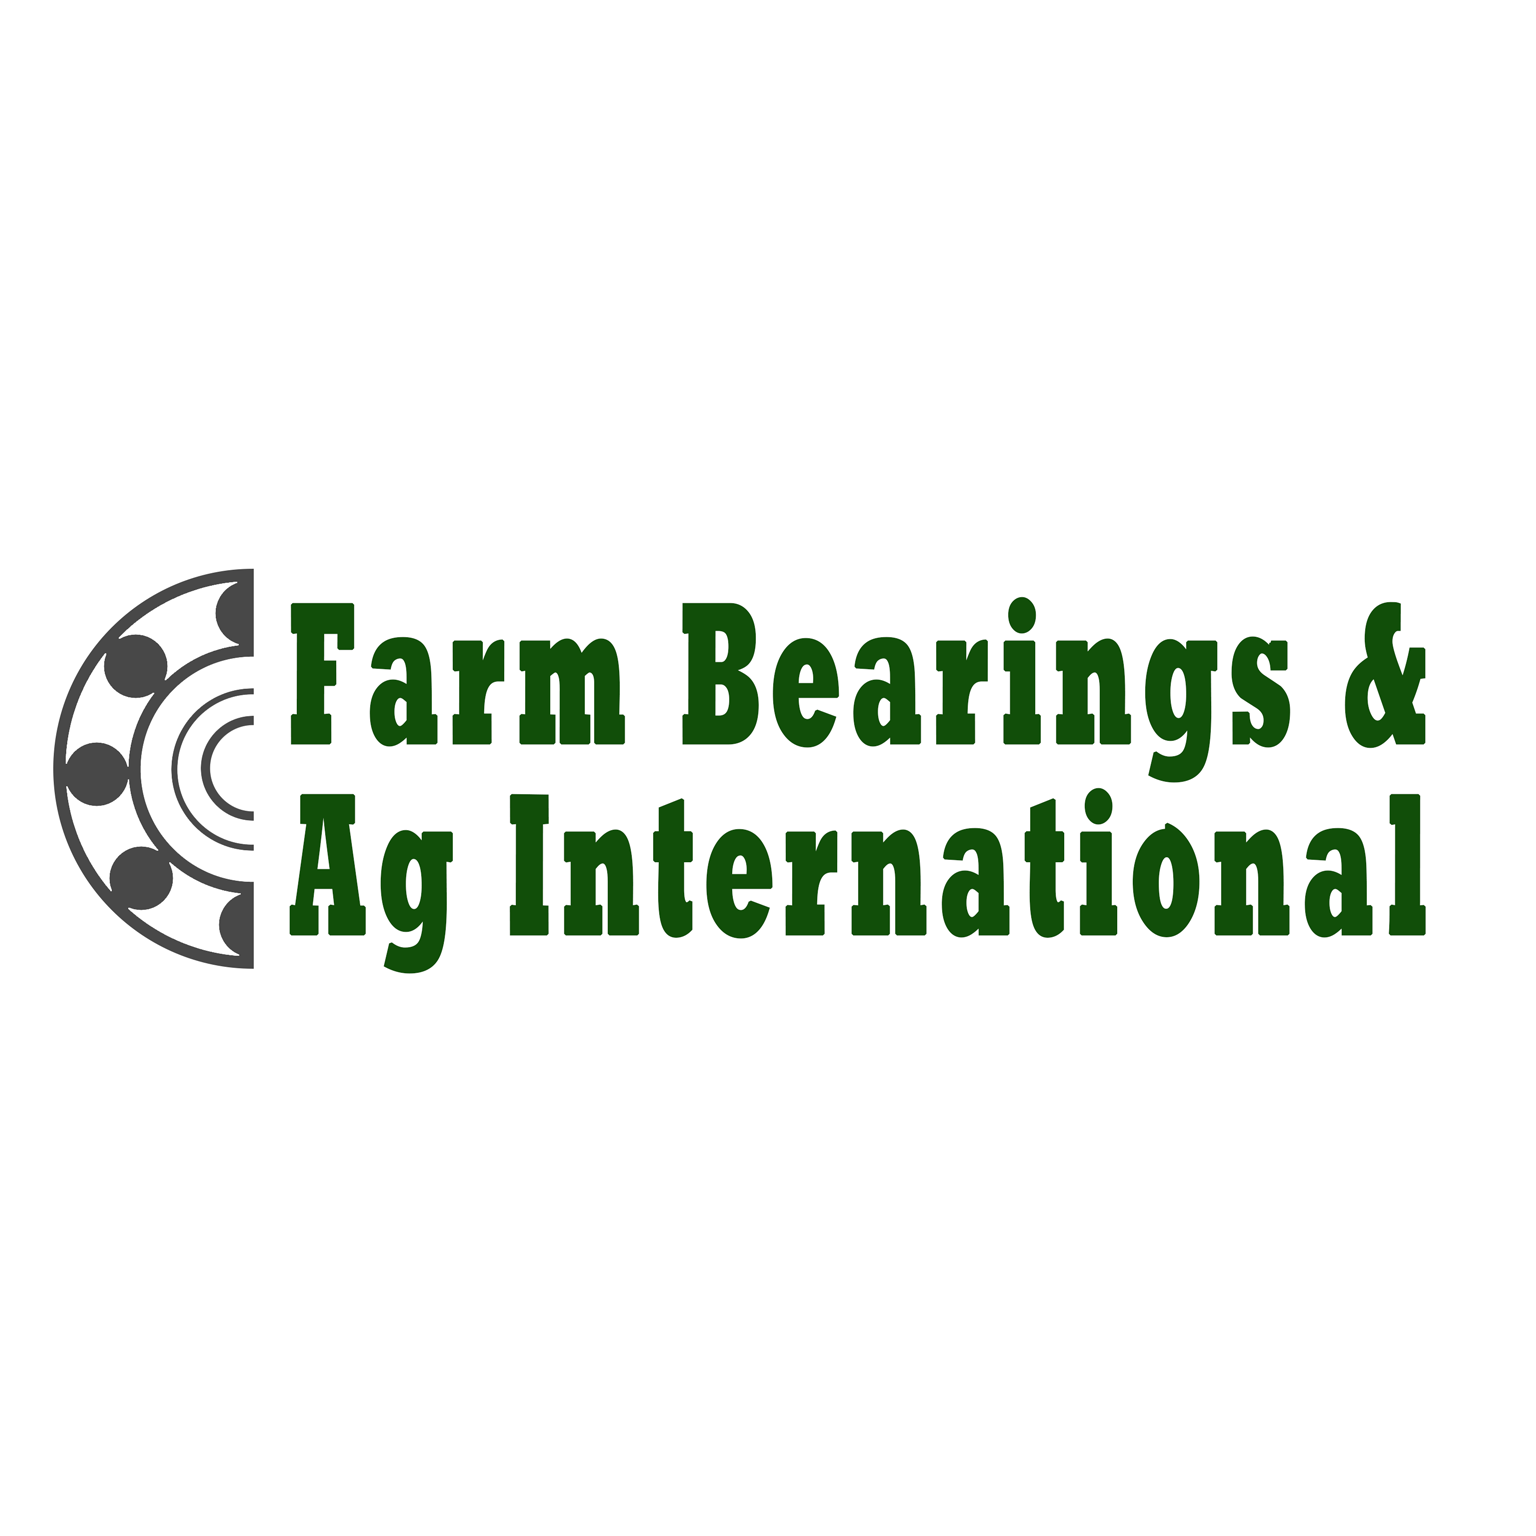 Farm Bearings & Ag International